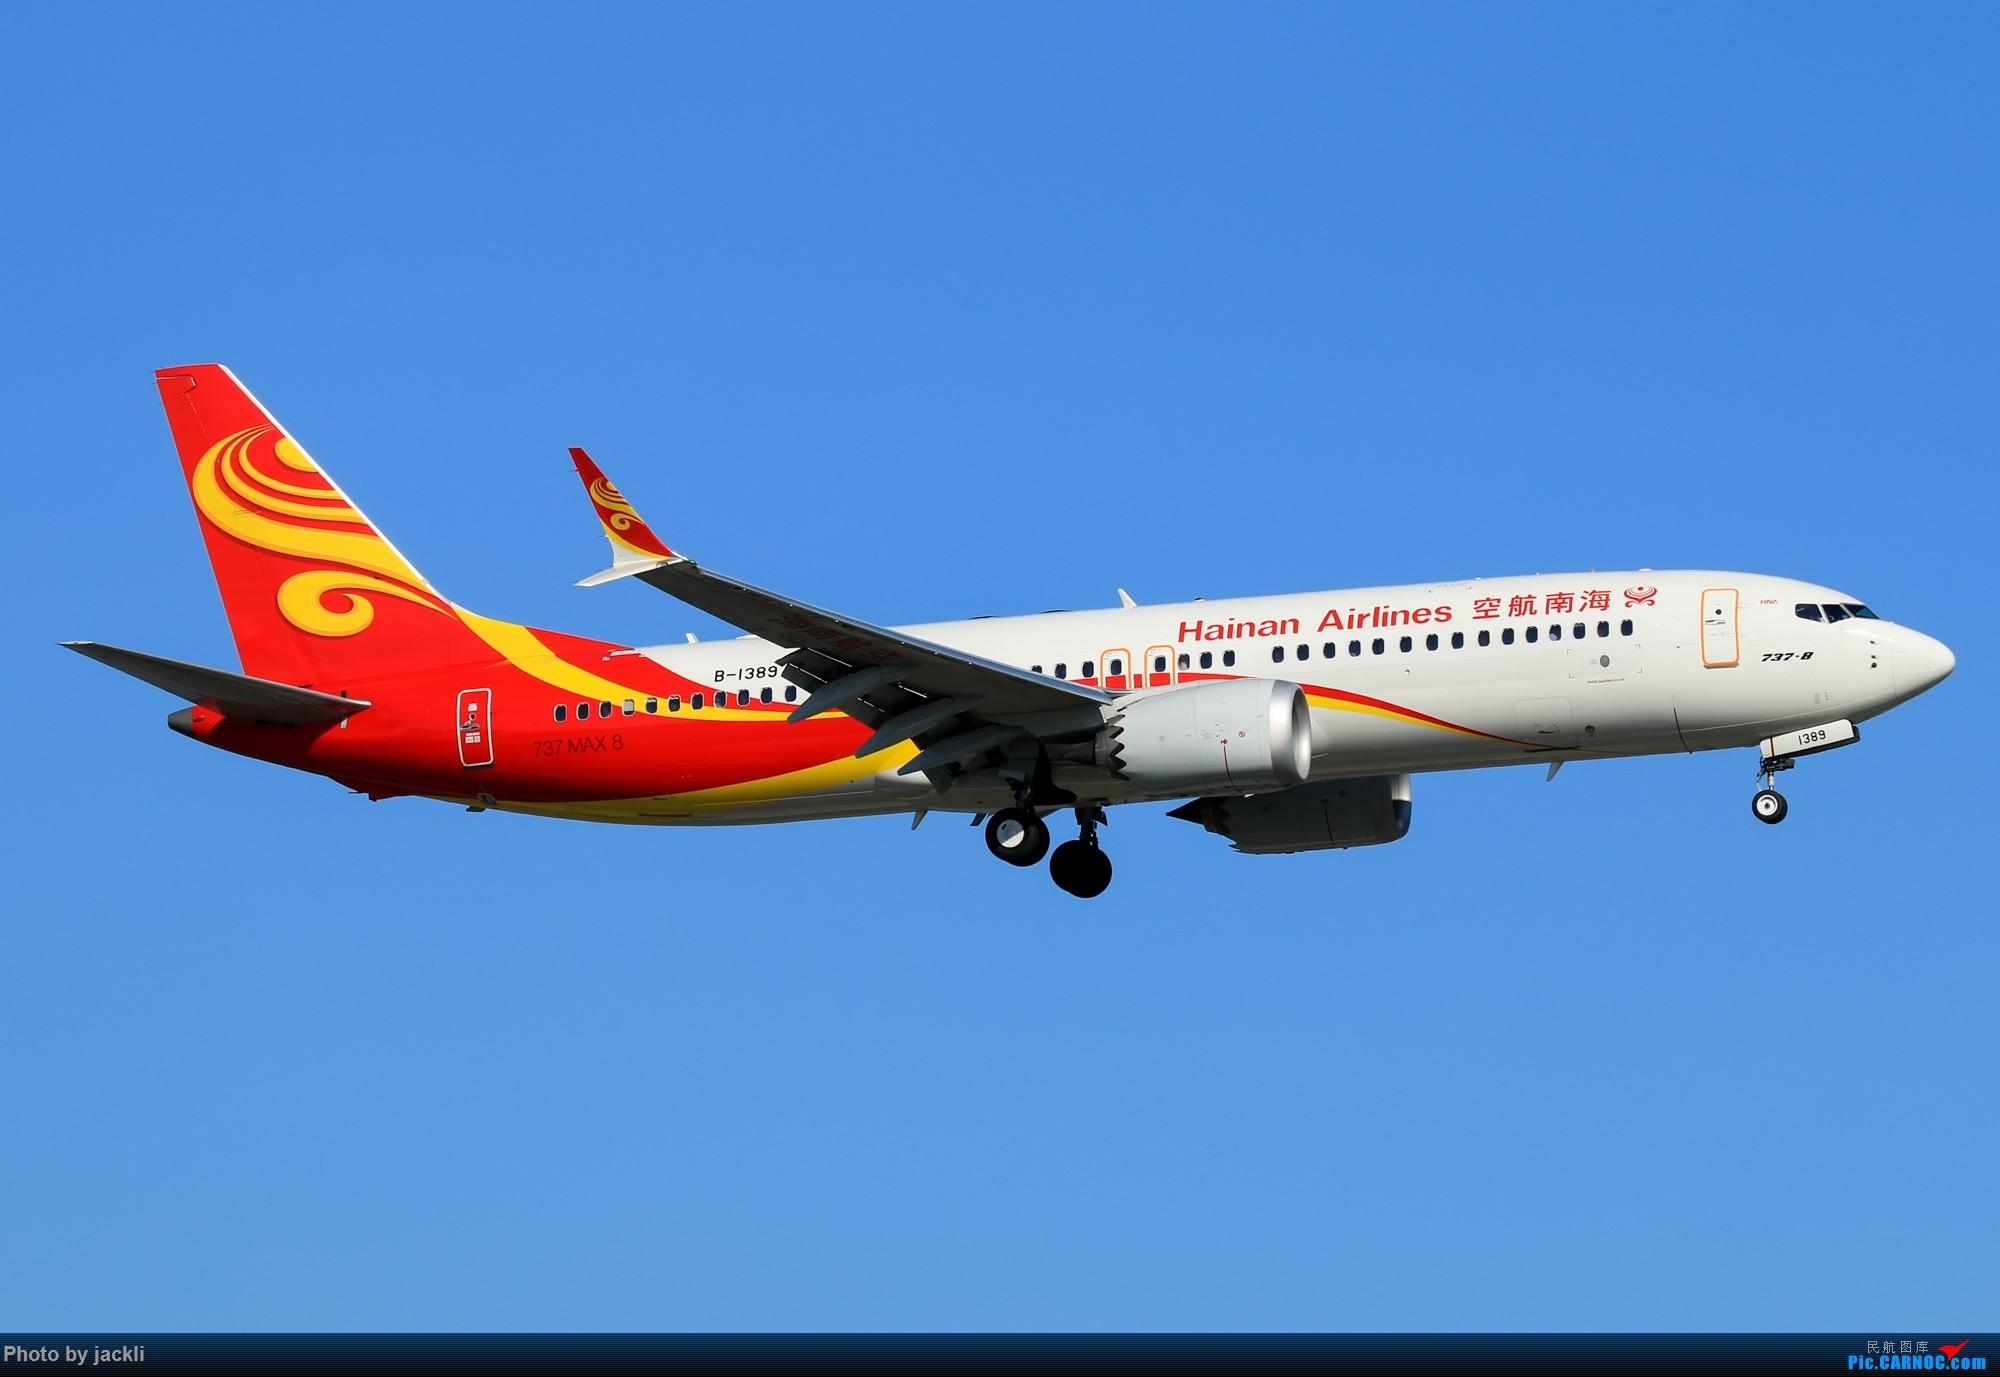 Re:[原创]【JackLi】抓住好天的尾巴~川航330在珠海训练~ BOEING 737MAX-8 B-1389 中国珠海金湾机场